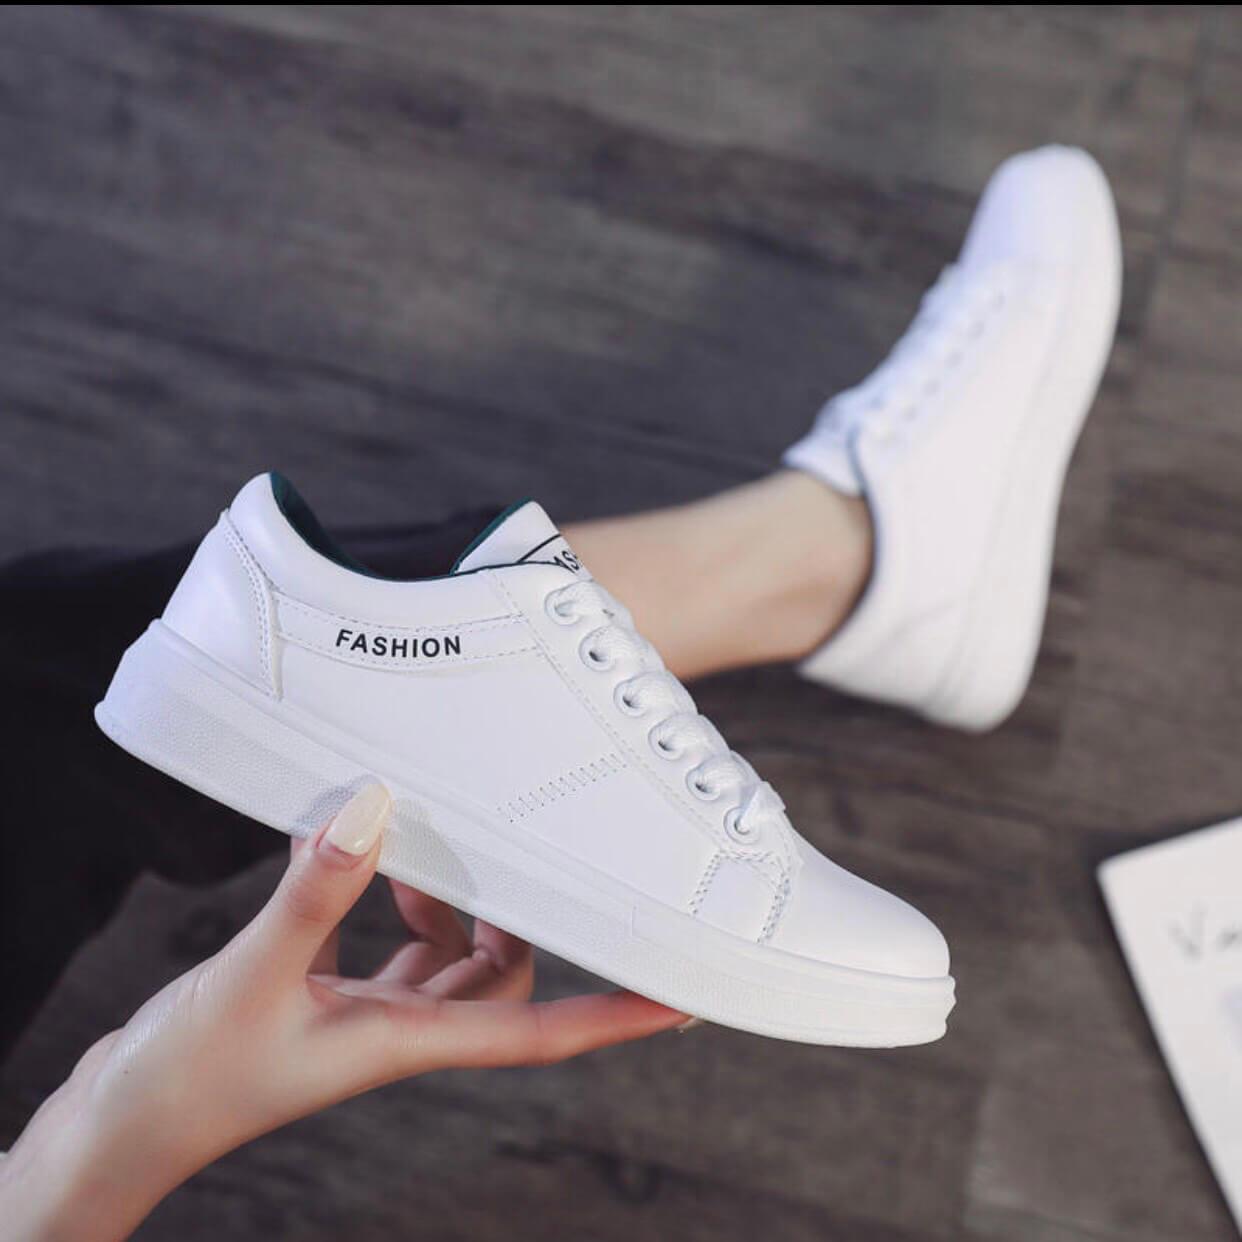 Giày Thể Thao Nữ TU1761 – StreetStyleShop.vn